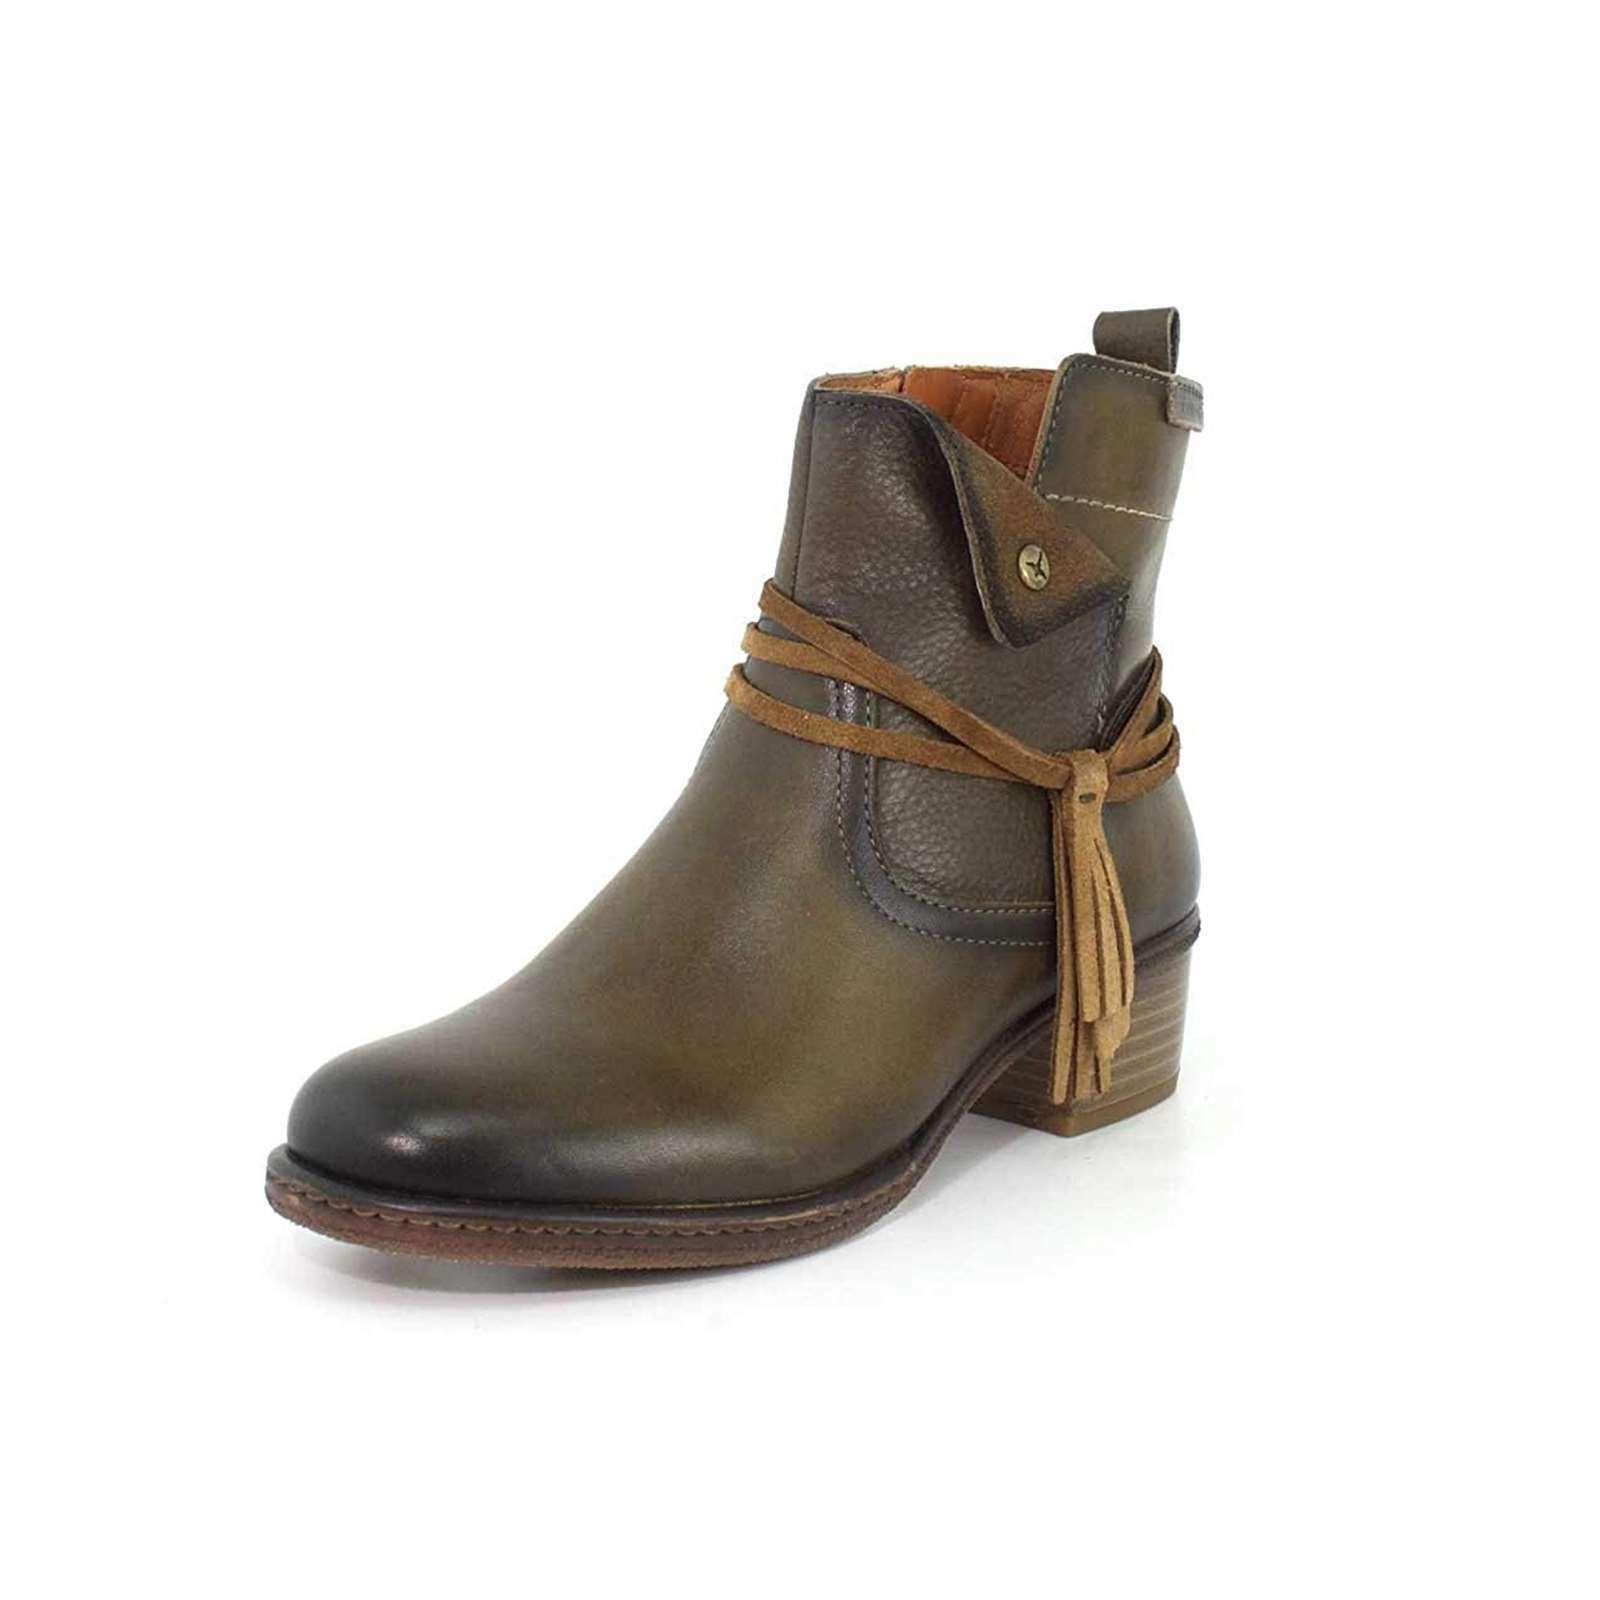 NEW Pikolinos Women's Women's Women's Casual shoes Leather Zaragoza Ankle Booties 1.5'' Heel bb0c3c